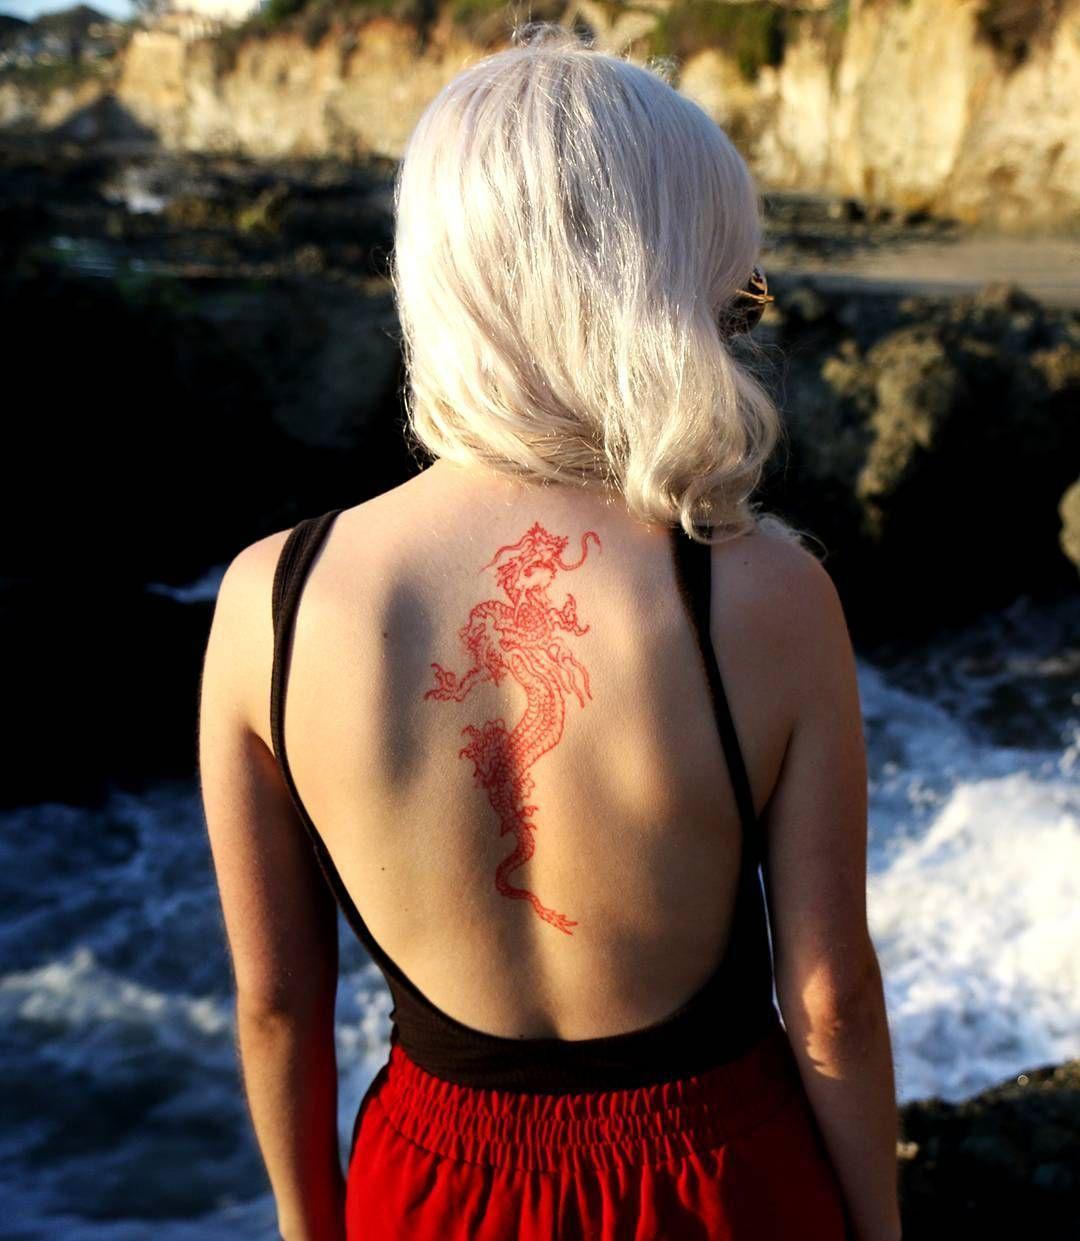 Het Krijgen Van Een Tattoo In Japan Guide Experience In 2020 Red Dragon Tattoo Red Ink Tattoos Red Tattoos